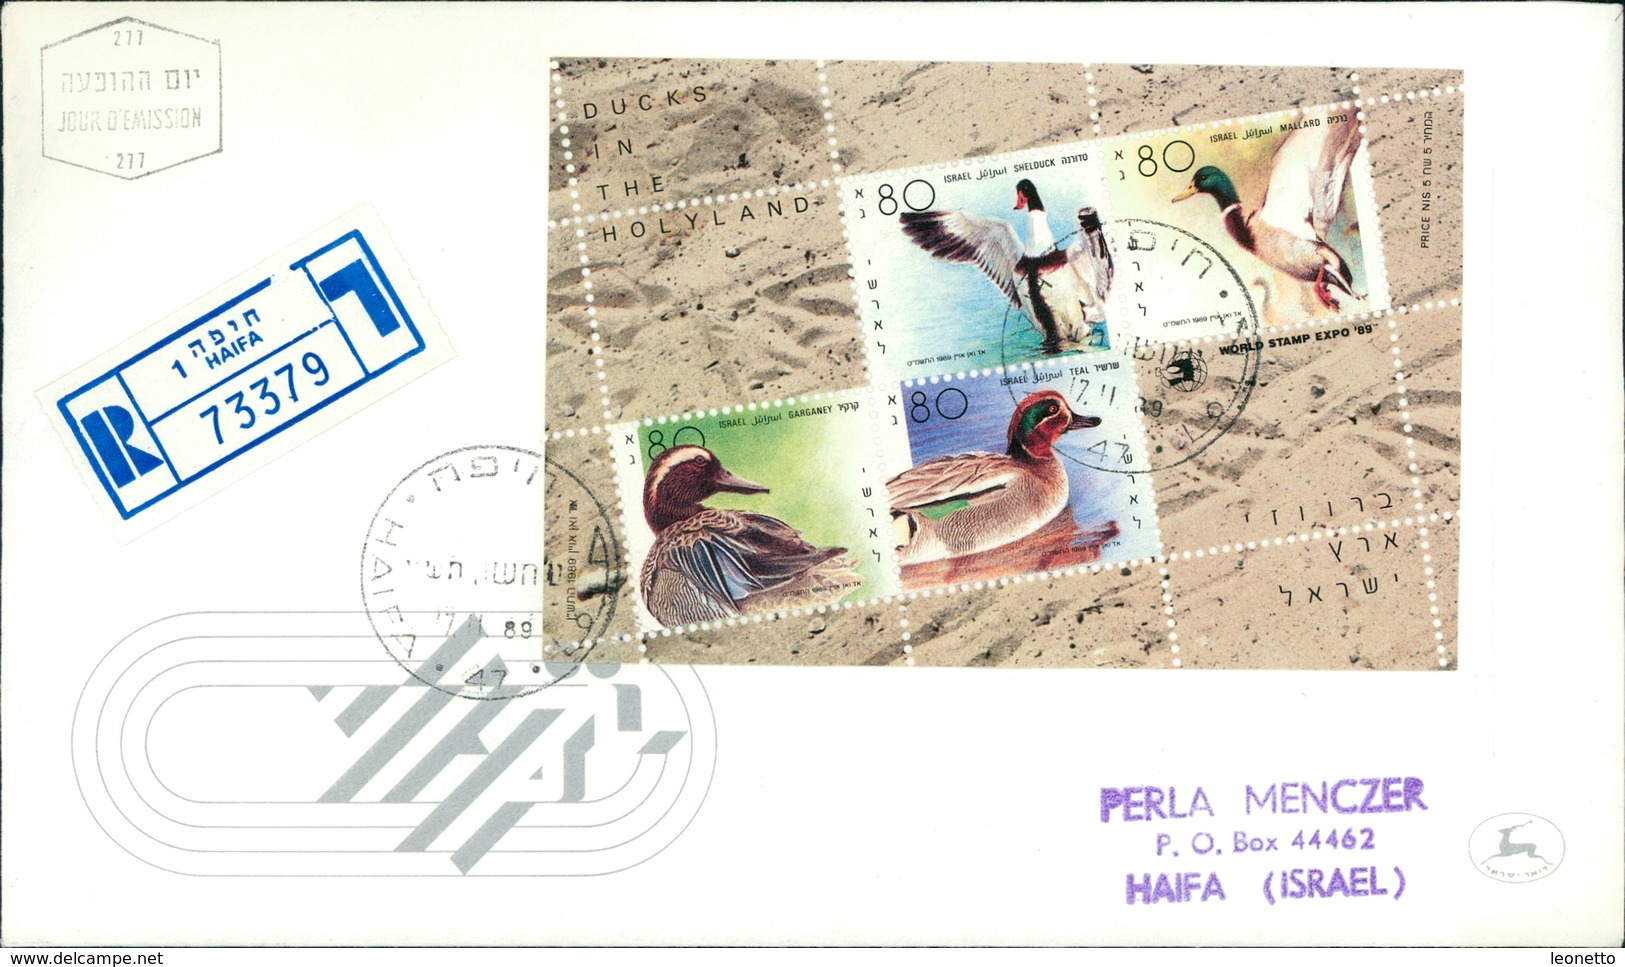 Israel 1989, WORLD STAMP EXPO '89, Washington, Gänse, Oie, Goose, Block 40, Sheet (4-189) - FDC